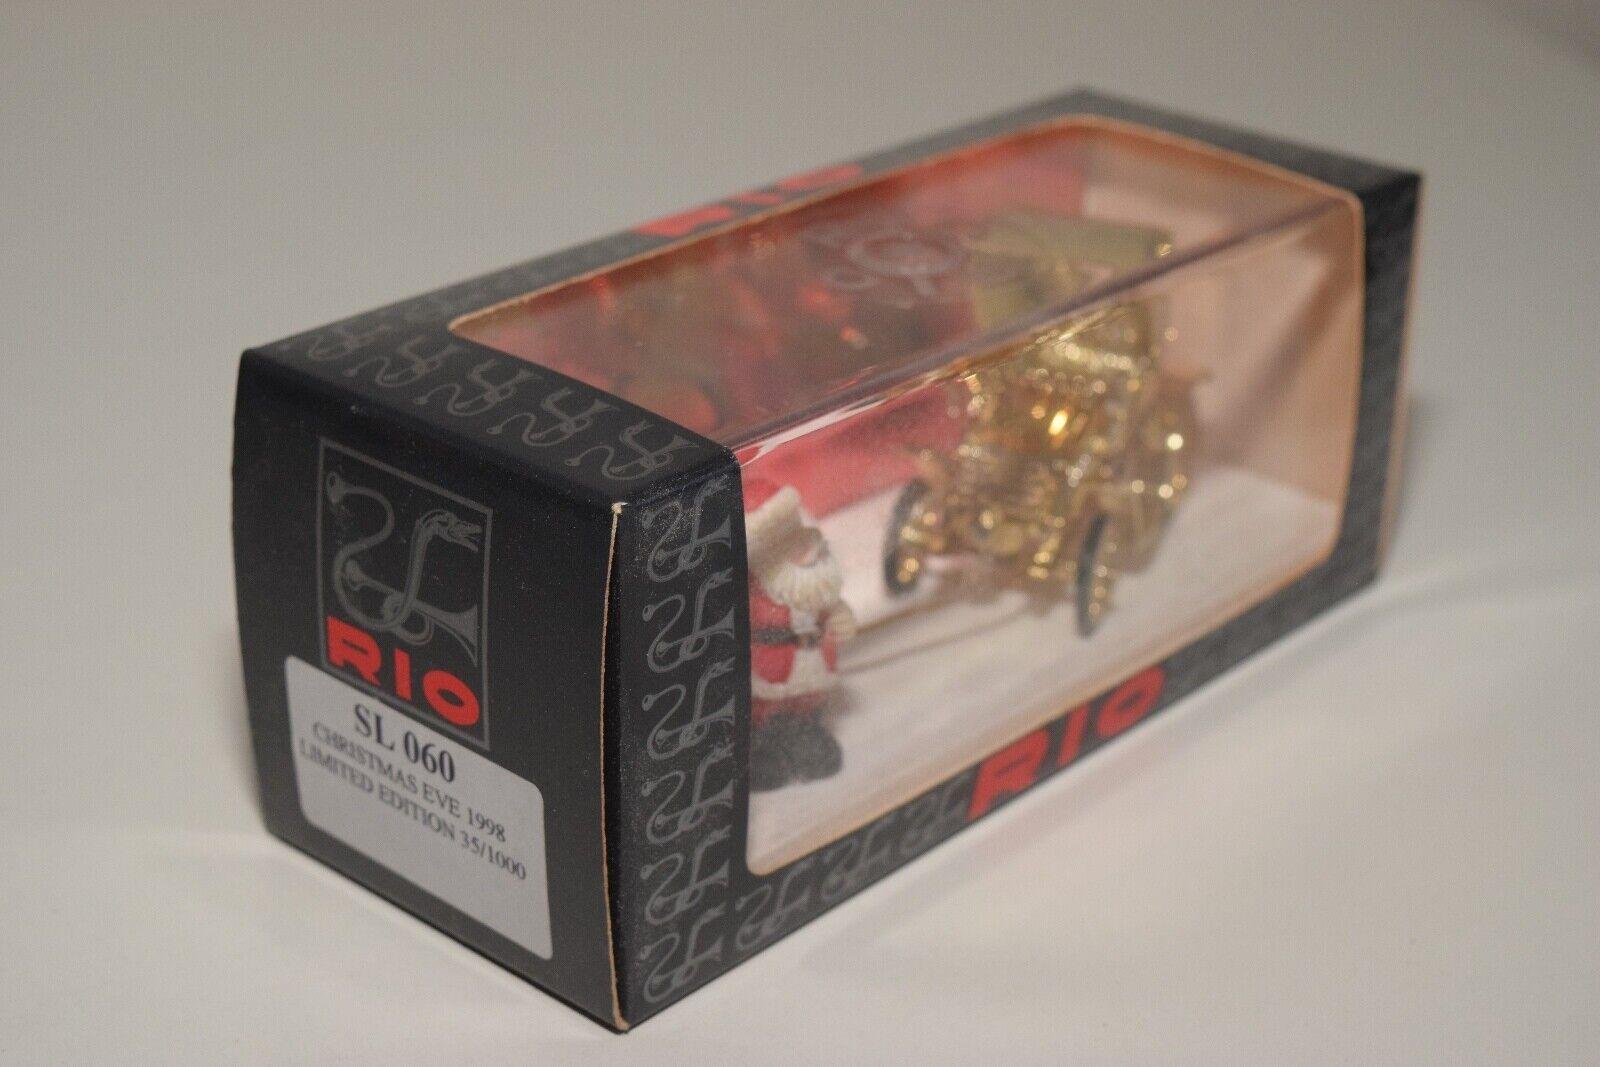 @. 1 43 RIO SL 060 CHRISTMAS CHRISTMAS CHRISTMAS EVE 1998 SANTA CAR LIMITED EDITION 35 1000 MIB RARE b2fc1d